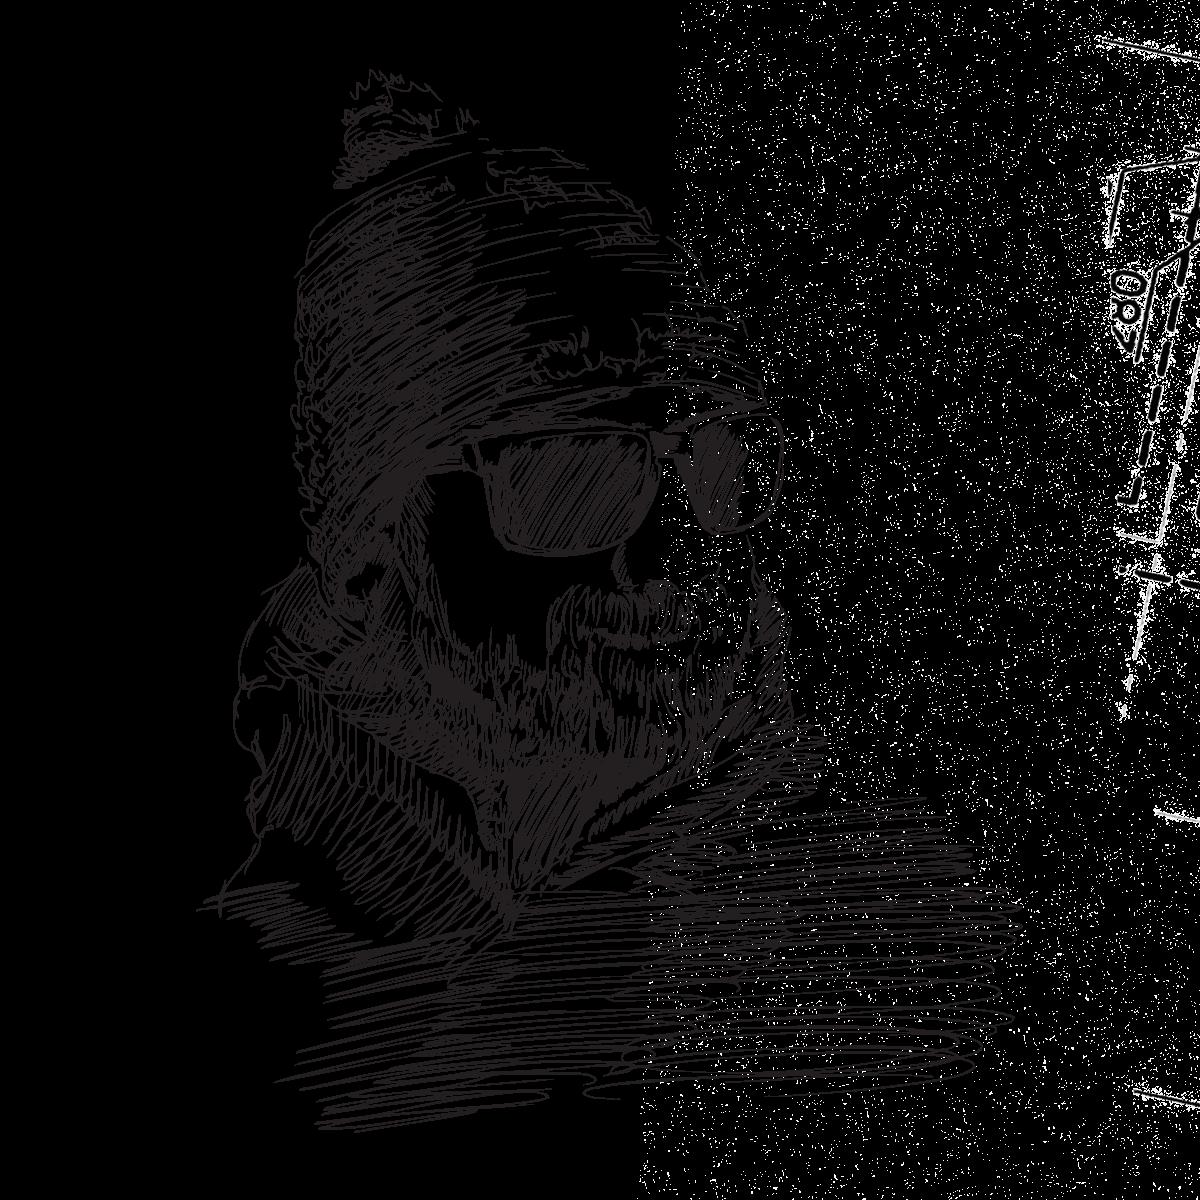 https://www.stijlinkleur.nl/wp-content/uploads/2017/05/minimalist-image-team-member-02-large.png